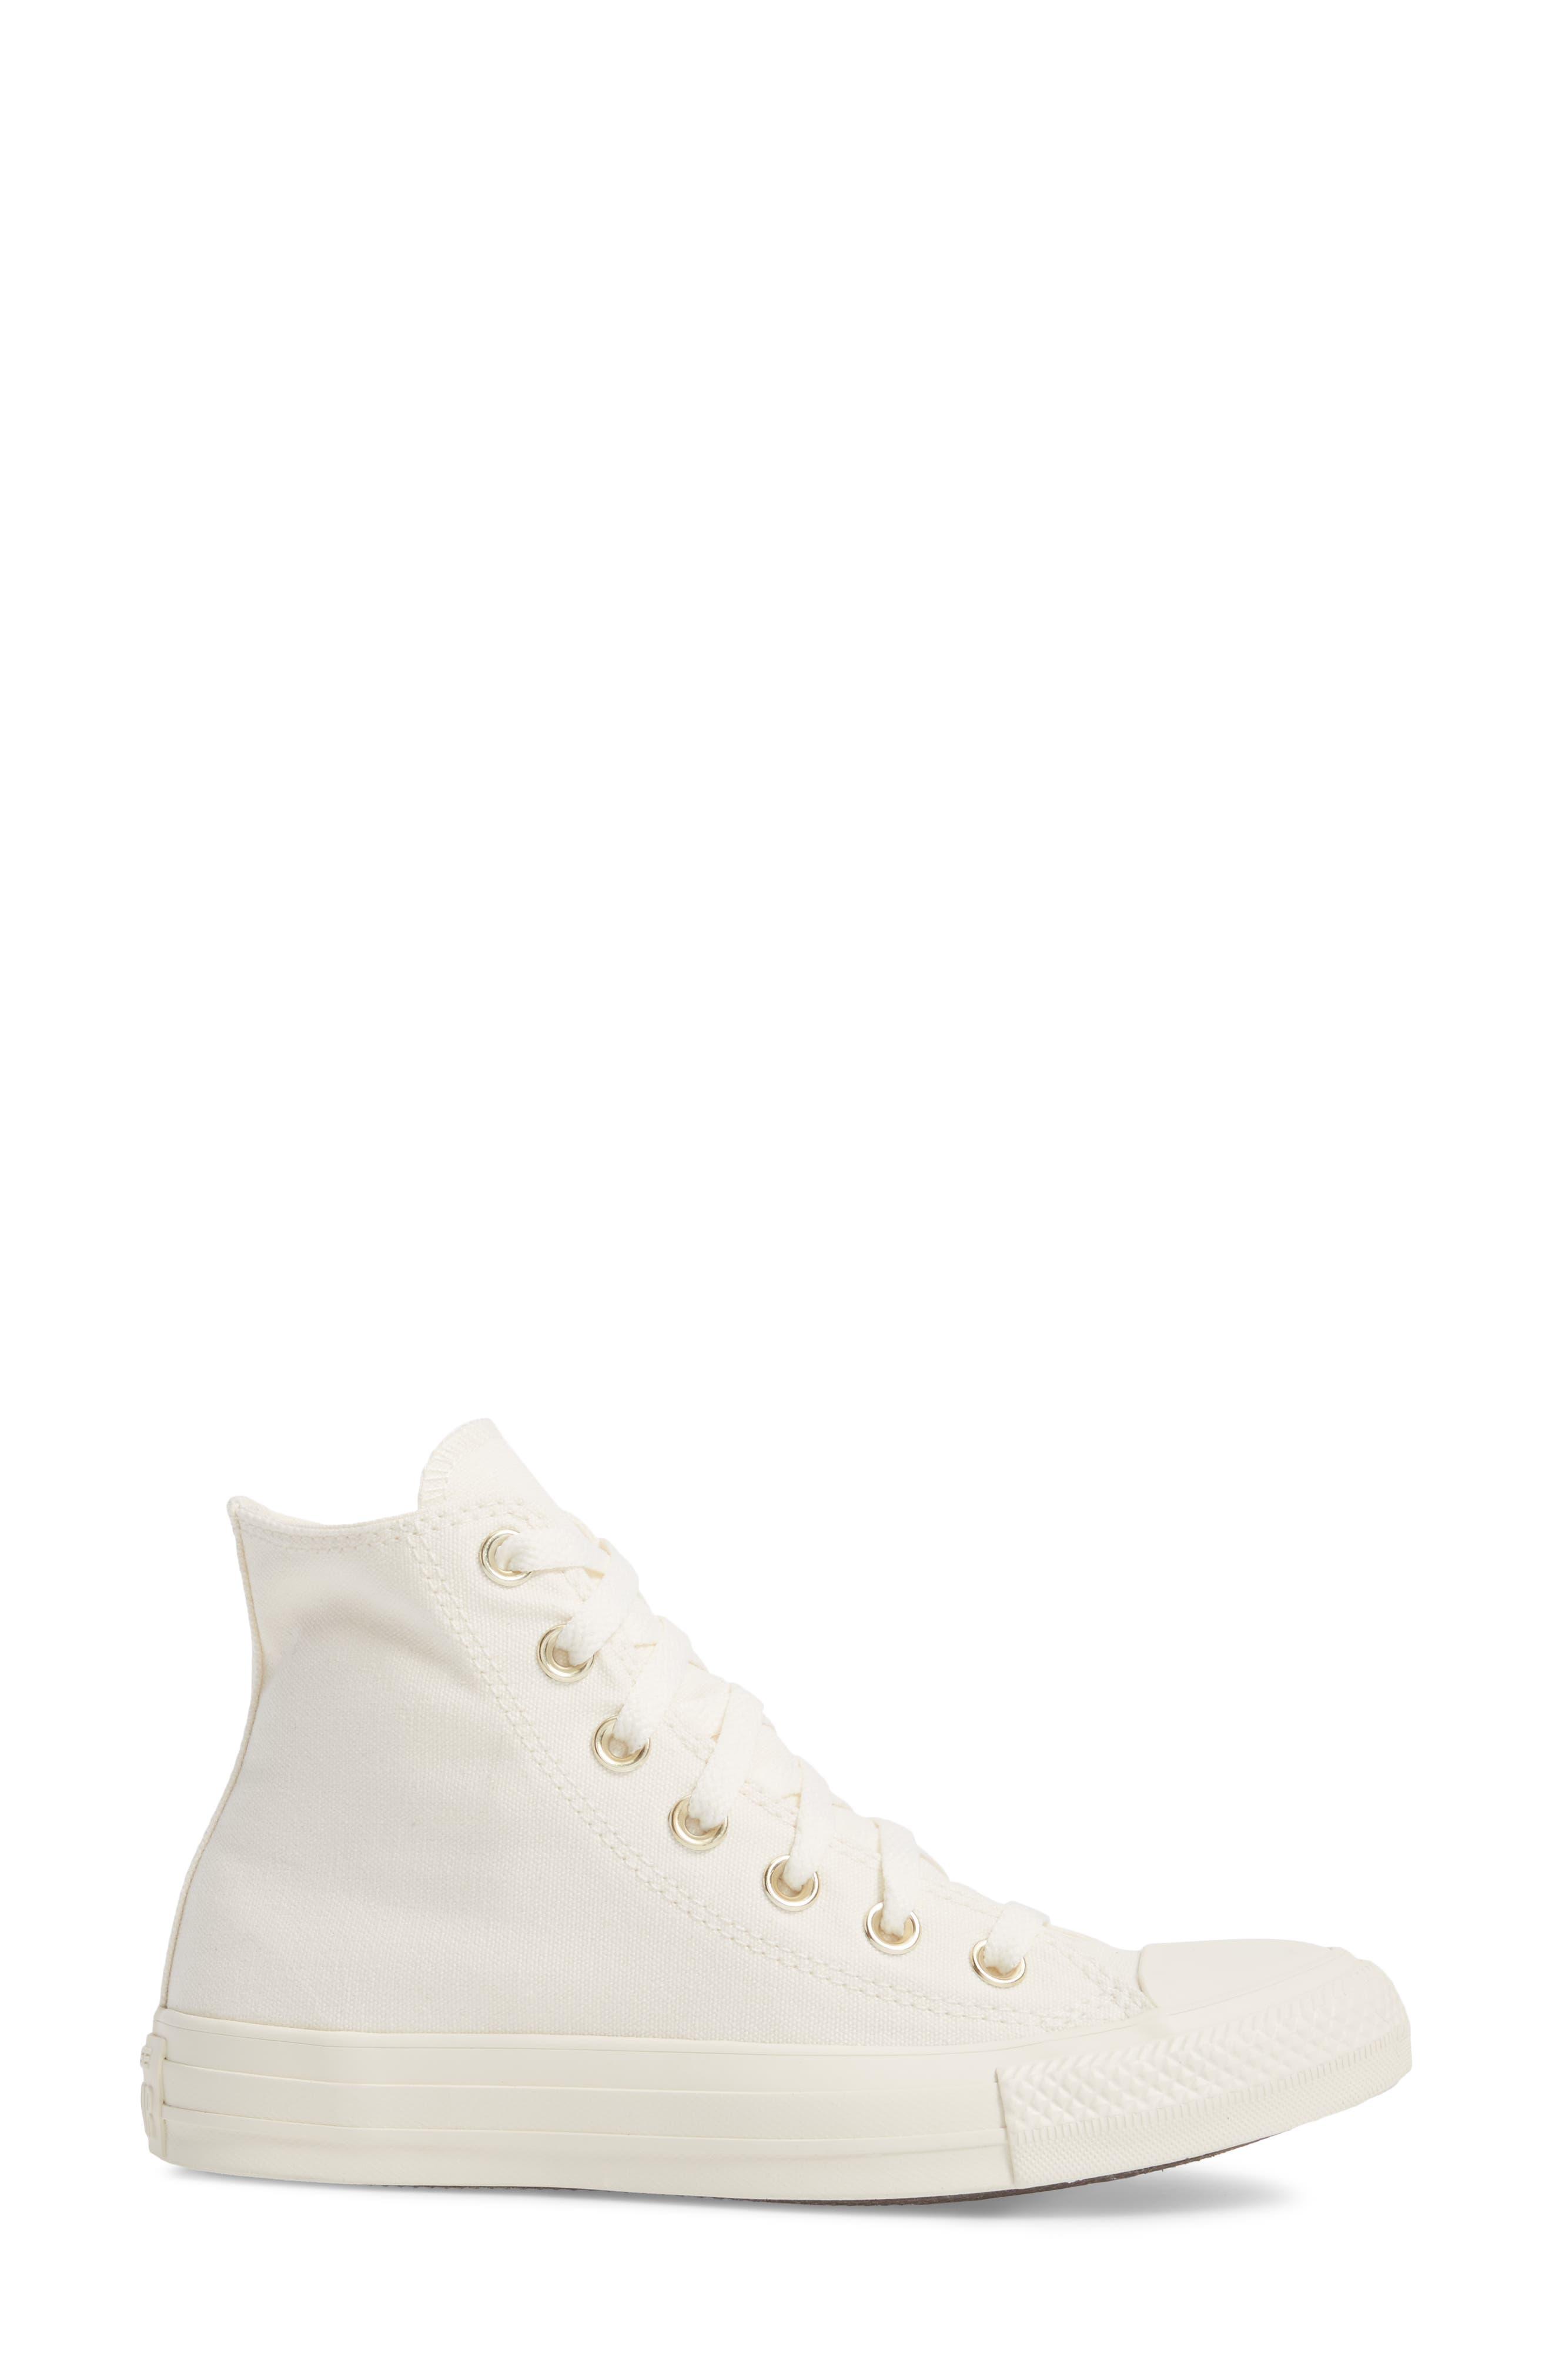 Chuck Taylor<sup>®</sup> All Star<sup>®</sup> Hi Sneaker,                             Alternate thumbnail 3, color,                             Egret